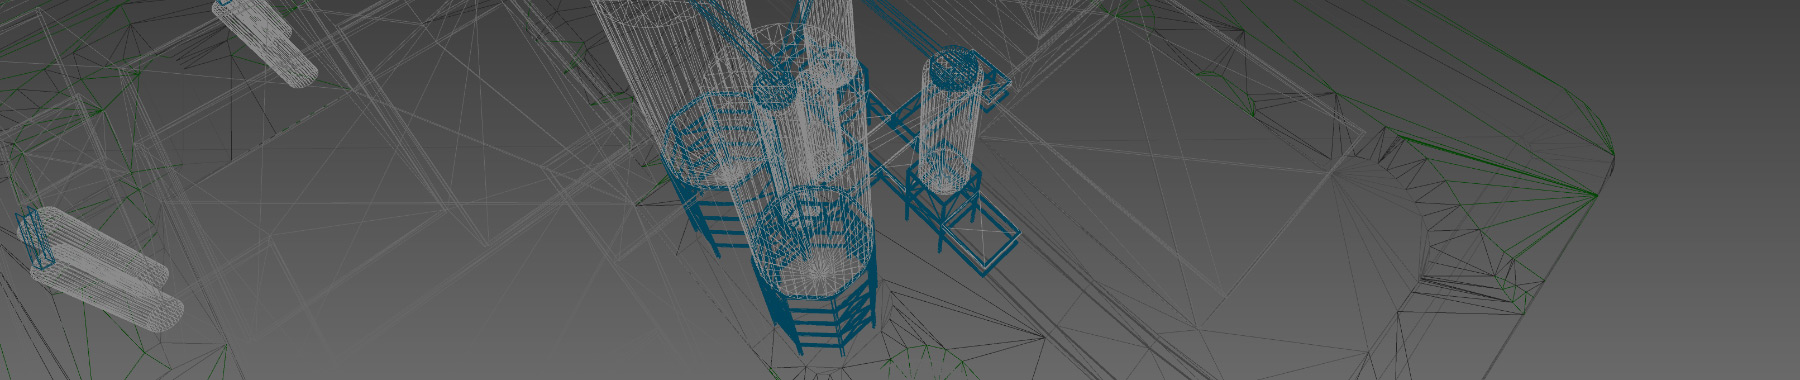 3D-Model Druckwärmespeicher